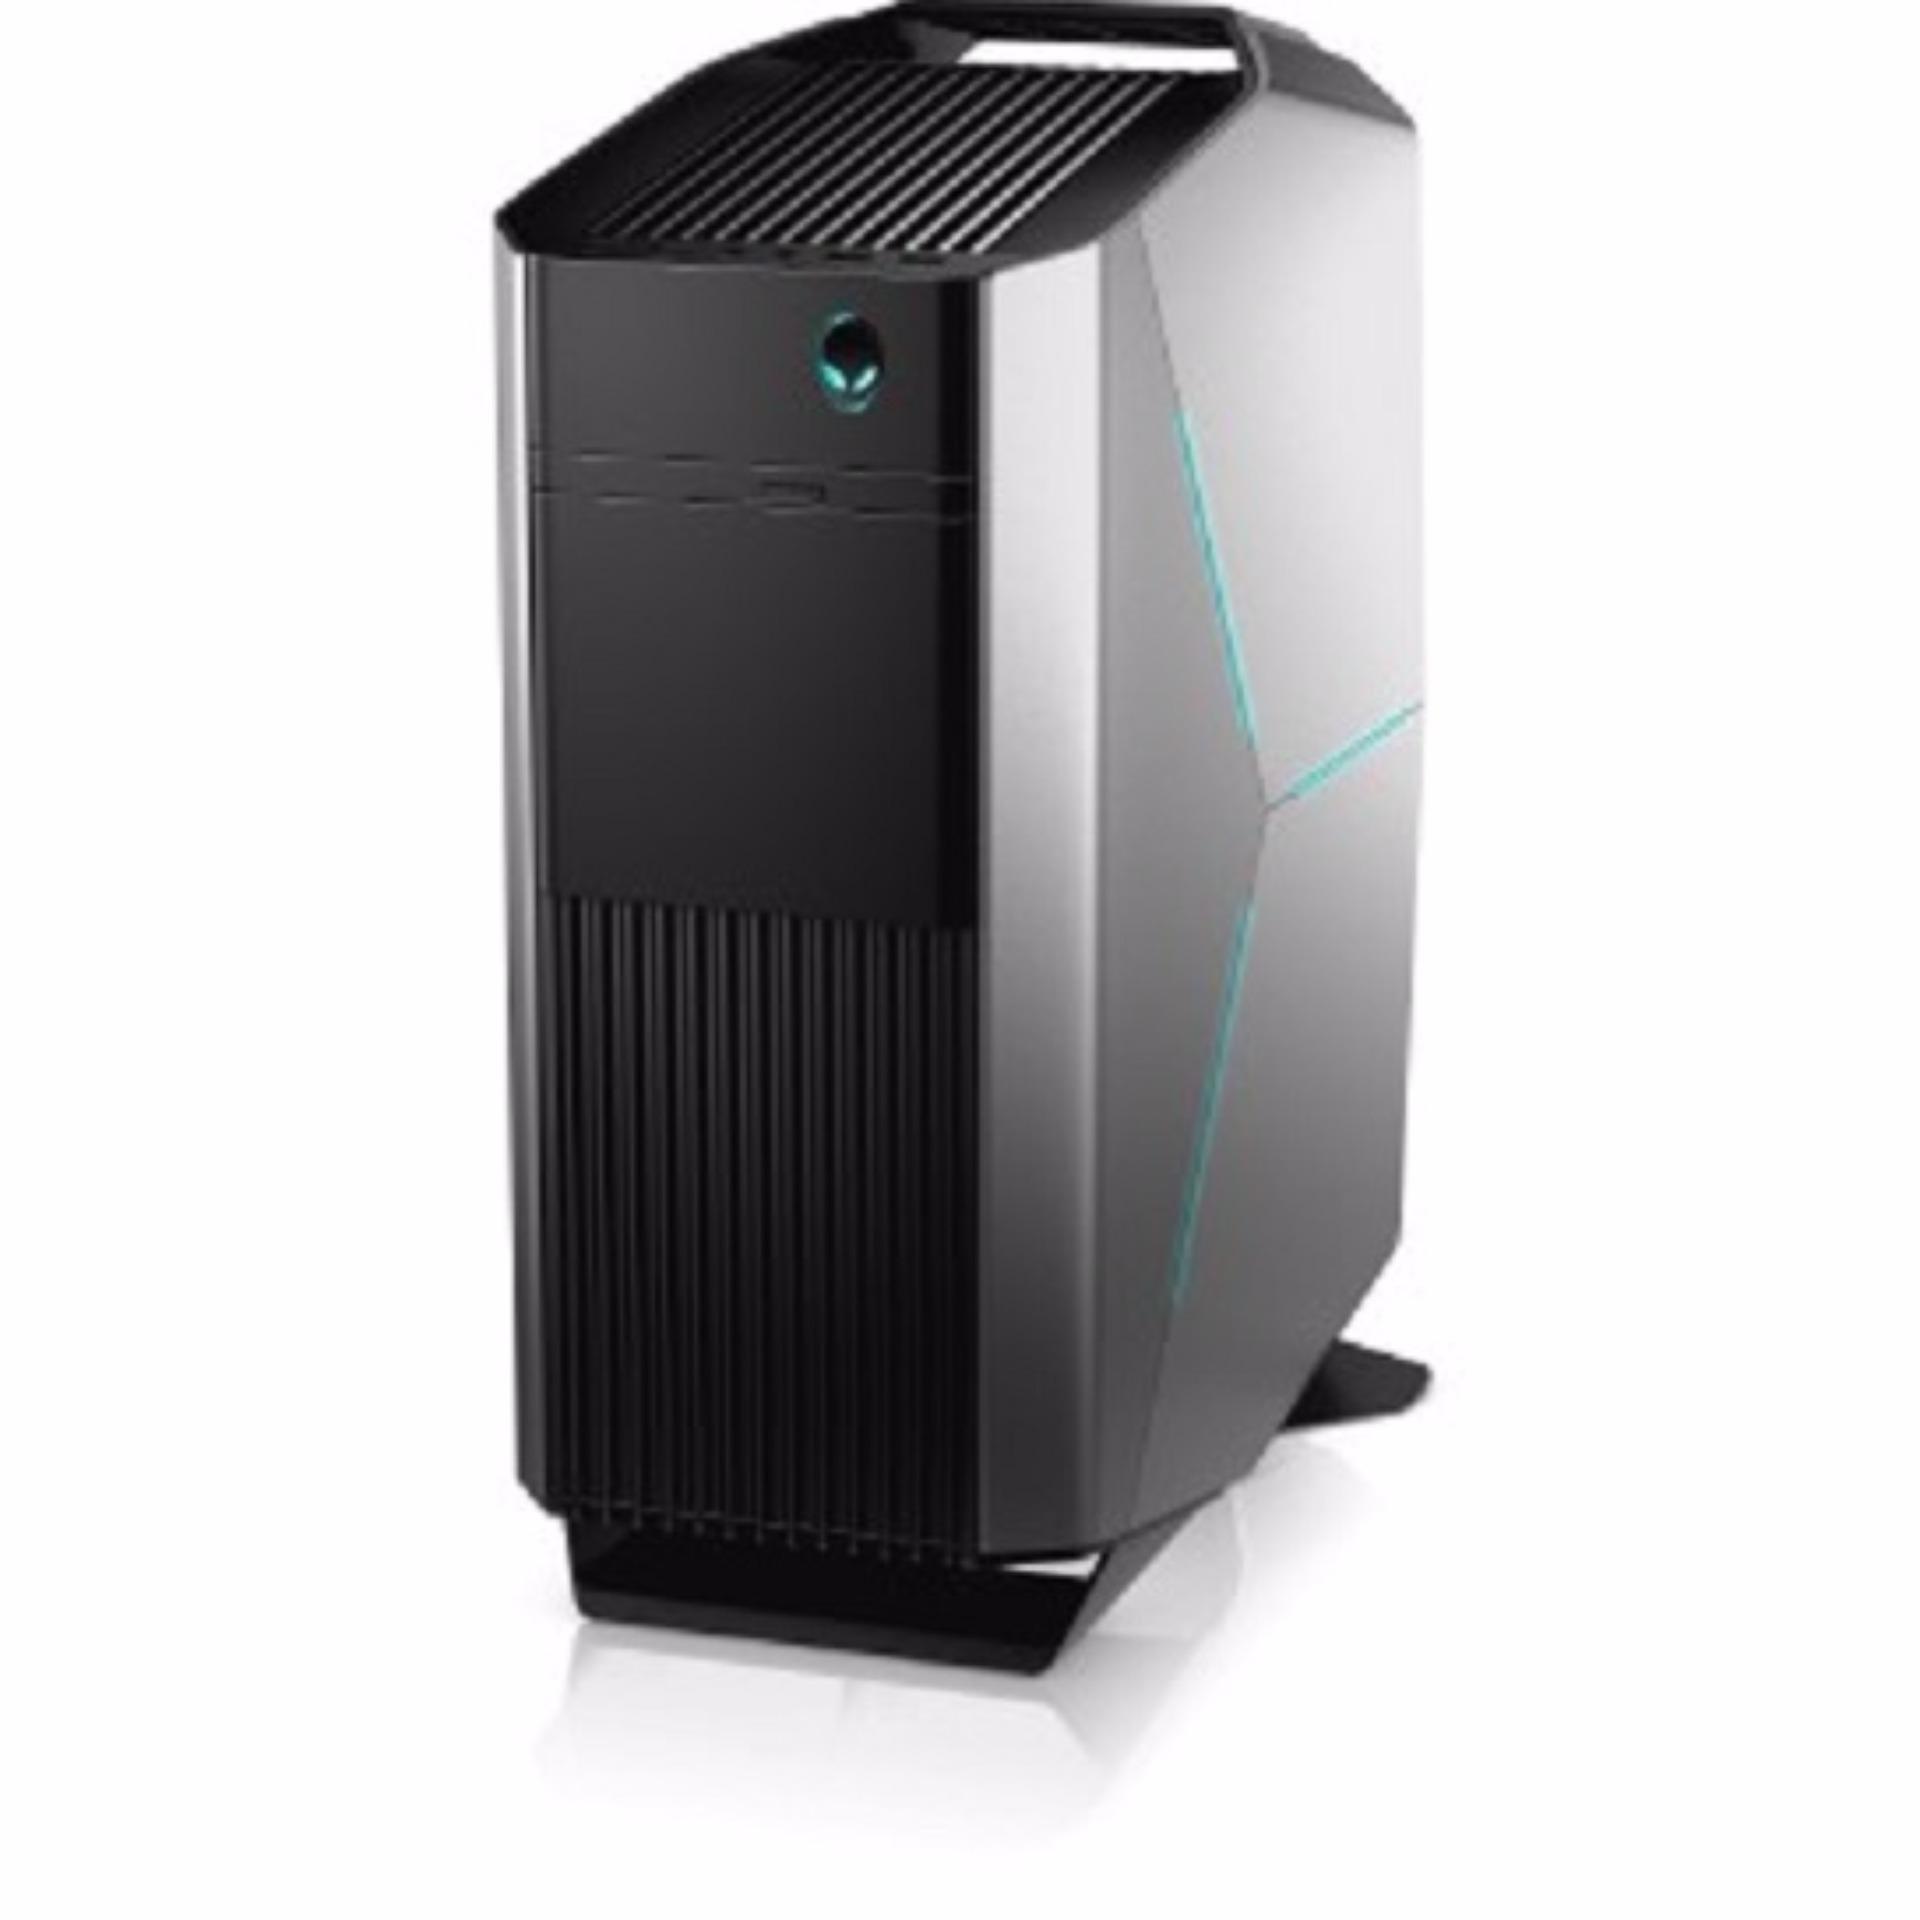 Dell Alienware Aurora R6-770318G (Intel i7-7700HQ, 32GB RAM, 1TB HDD + 256GB SSD, GTX1080(8G)